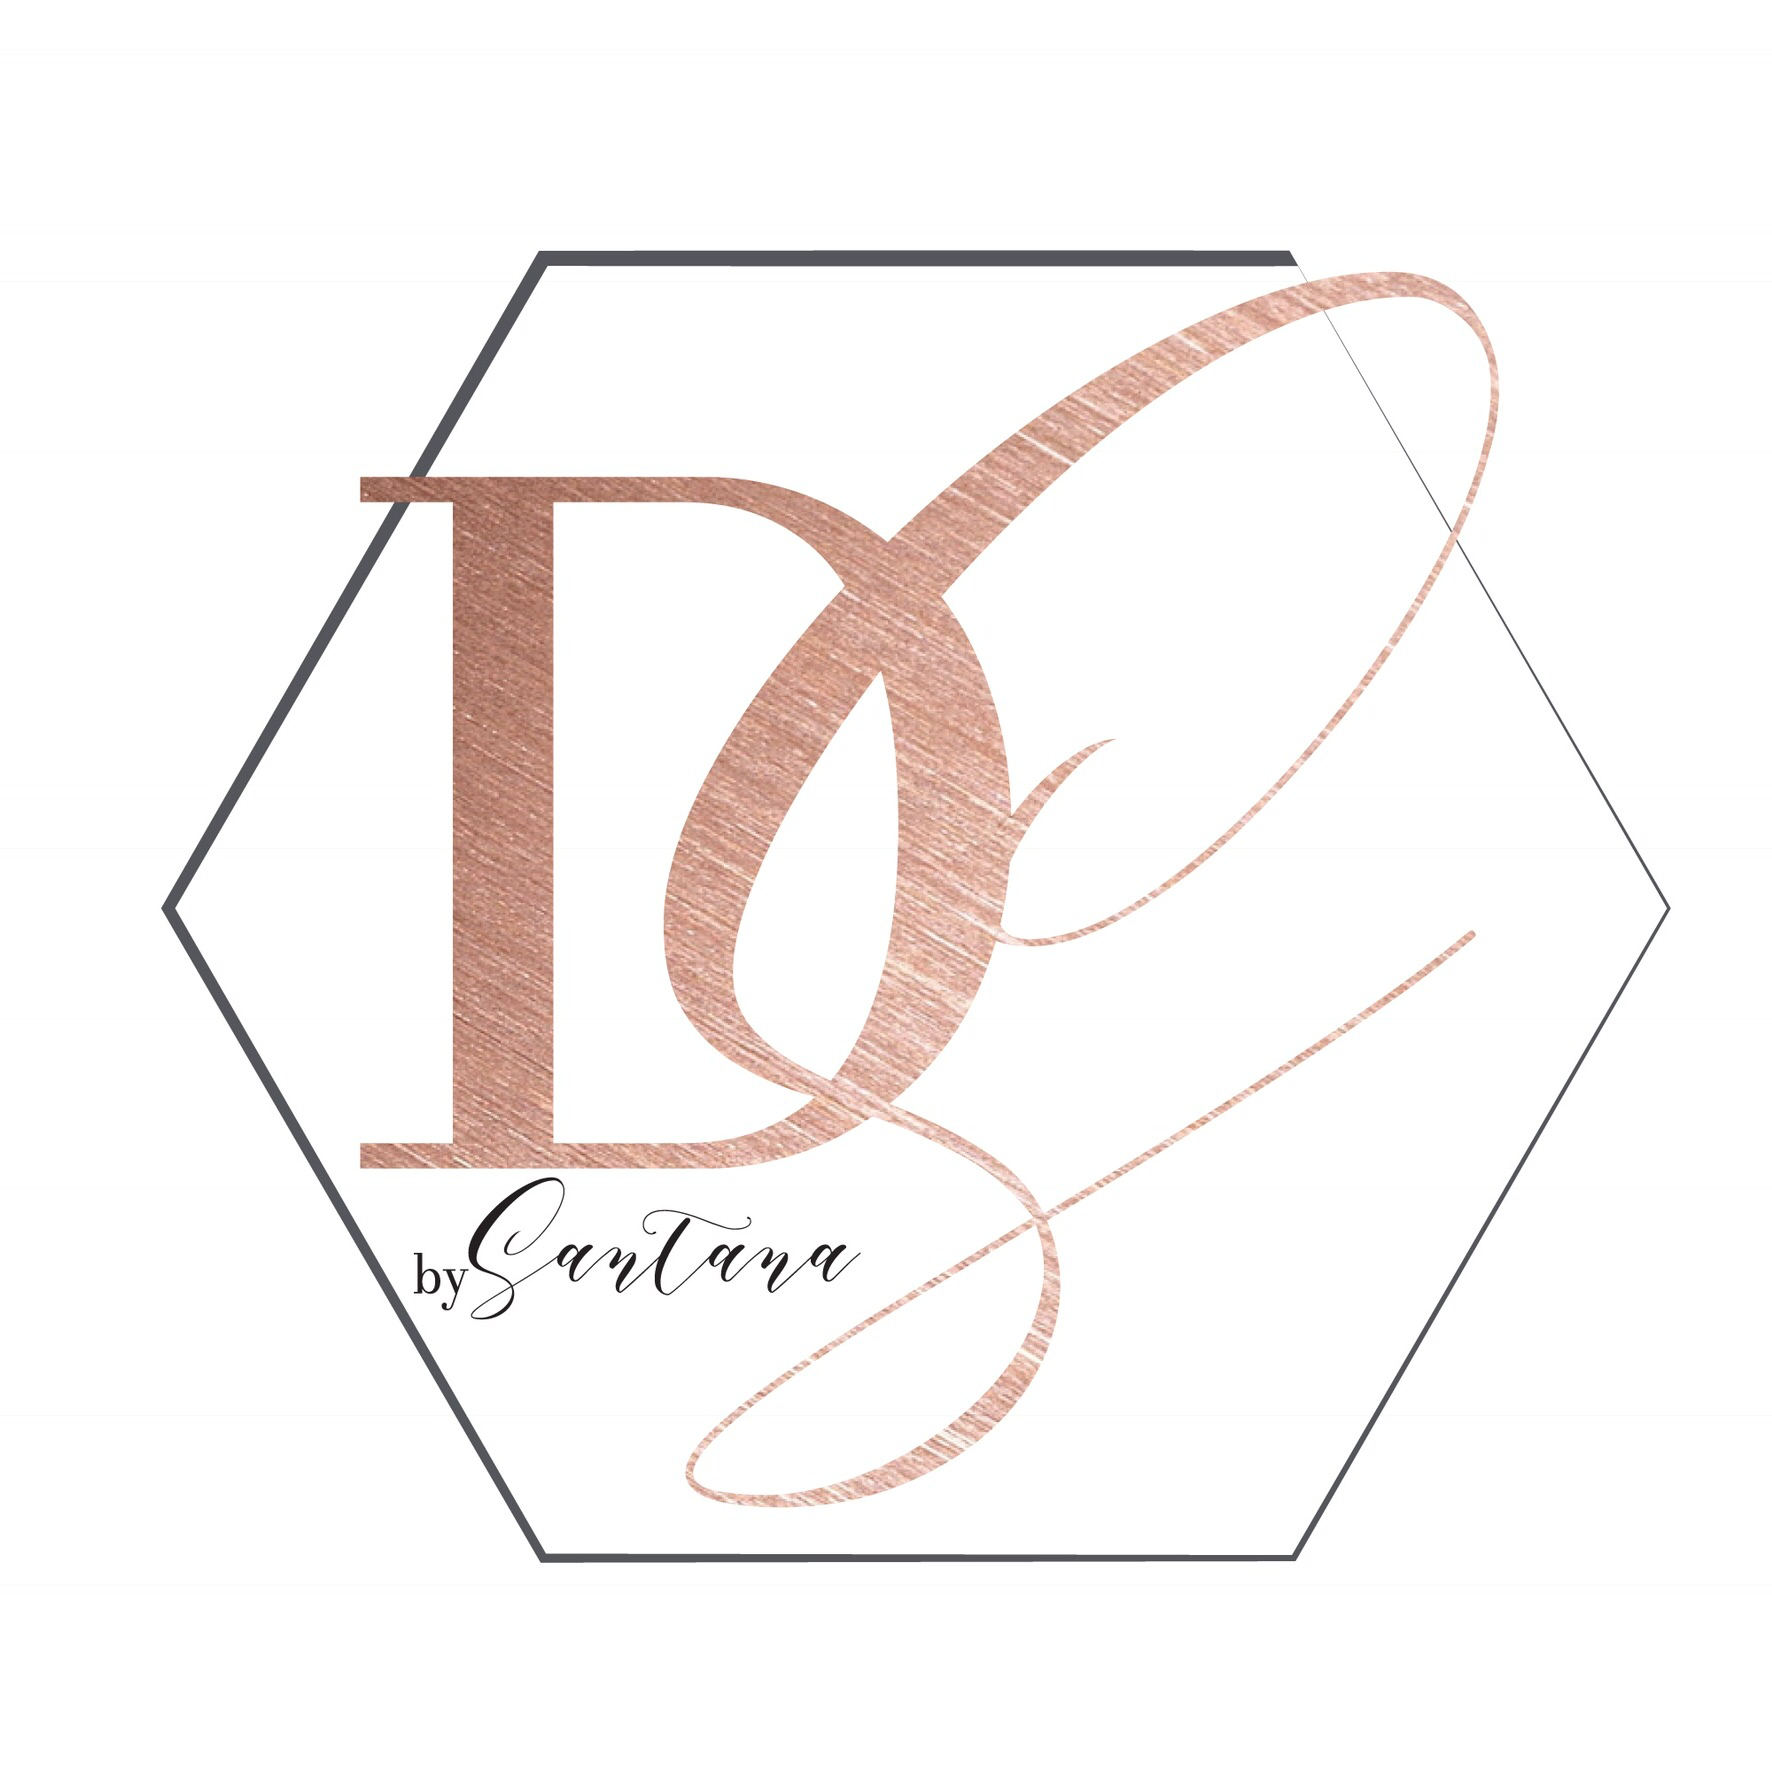 Designer Soirees by Santana image